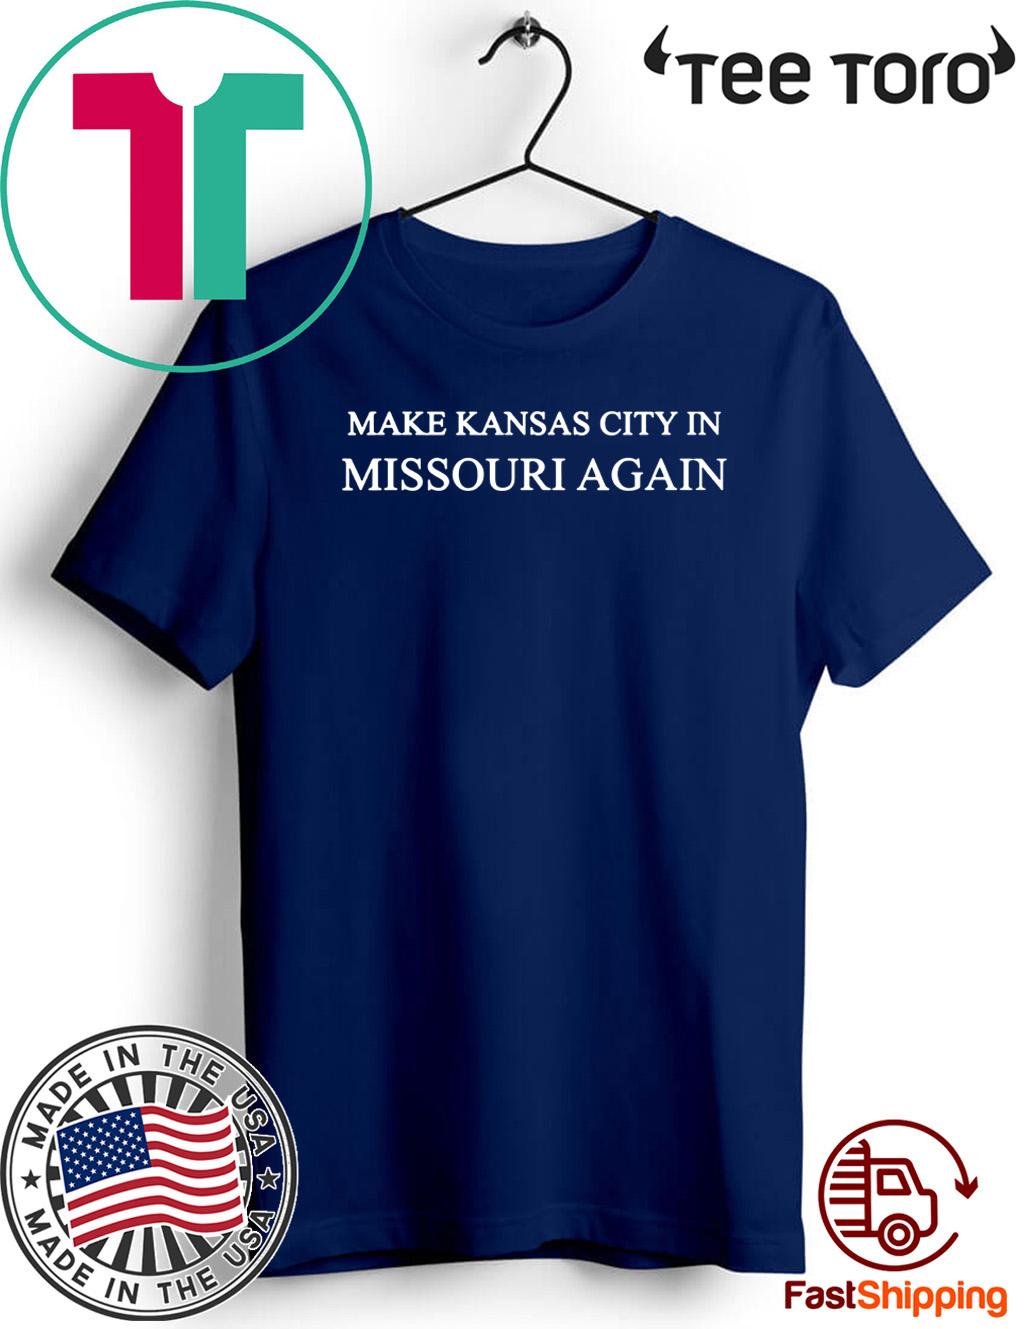 Make Kansas City In Missouri Again Funny Donald Trump For T-Shirt